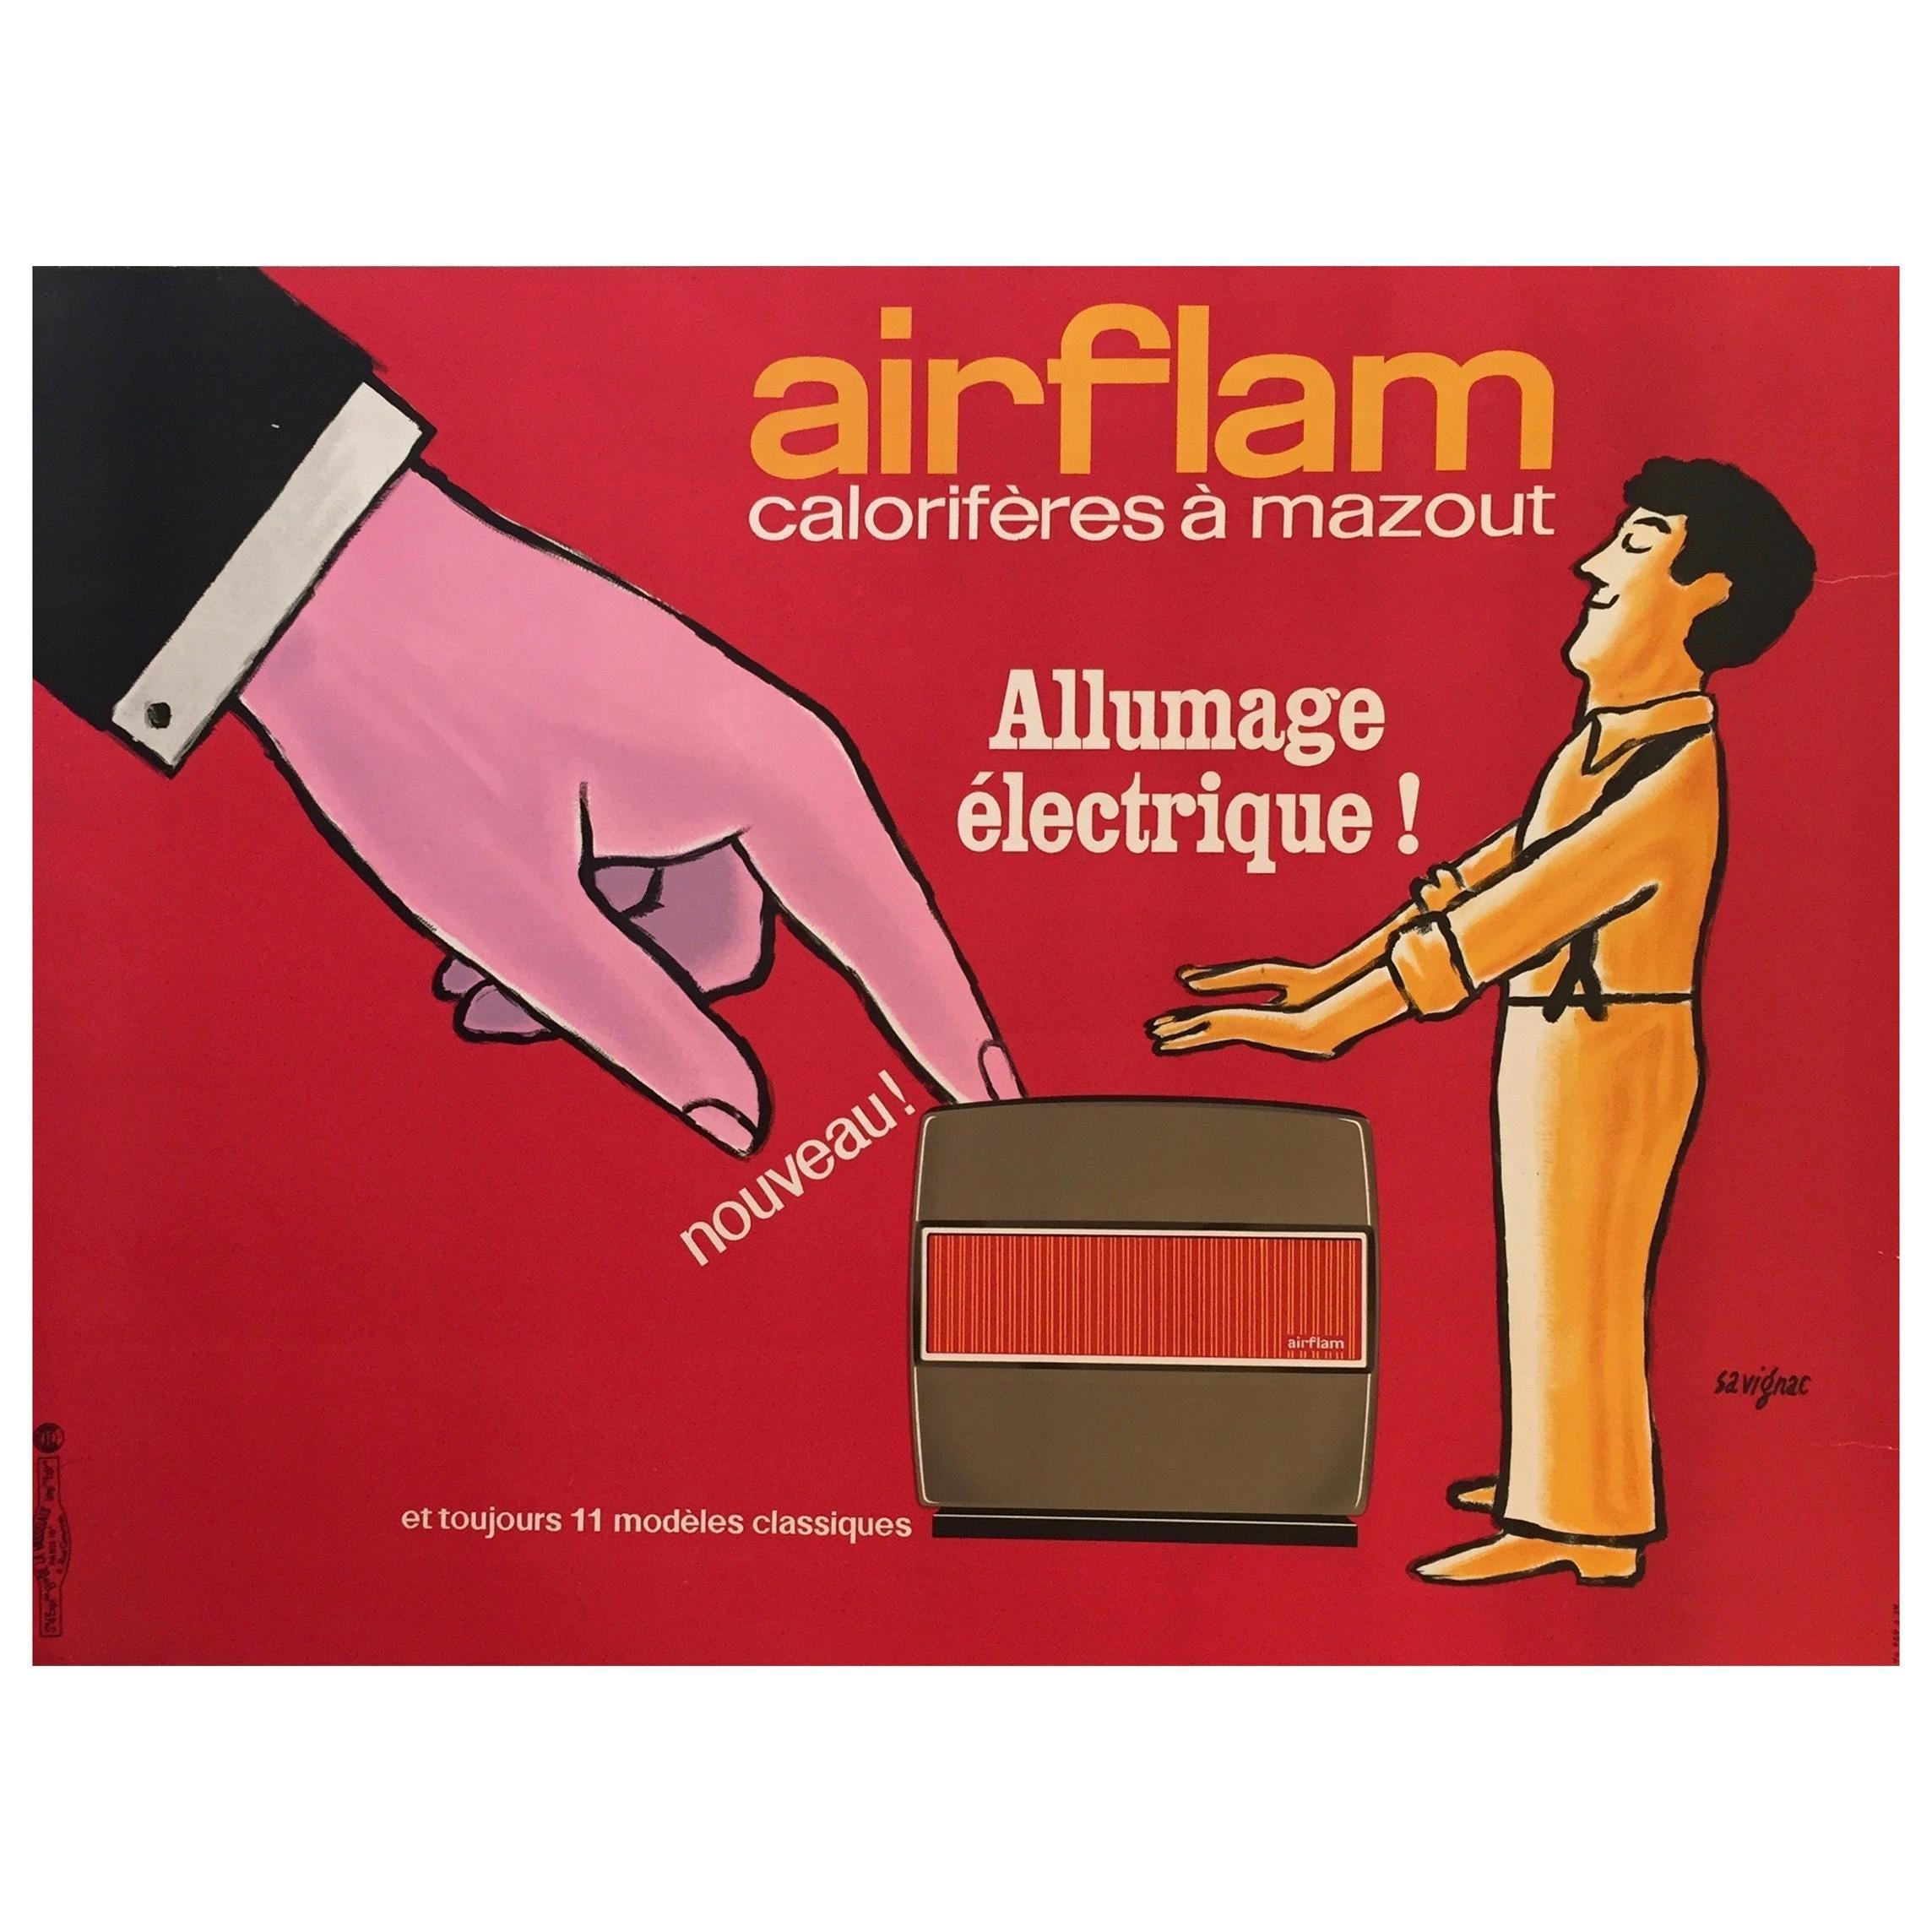 Savignac, Original Vintage French Advertisement Poster, 'Airflam' Heating, 1967